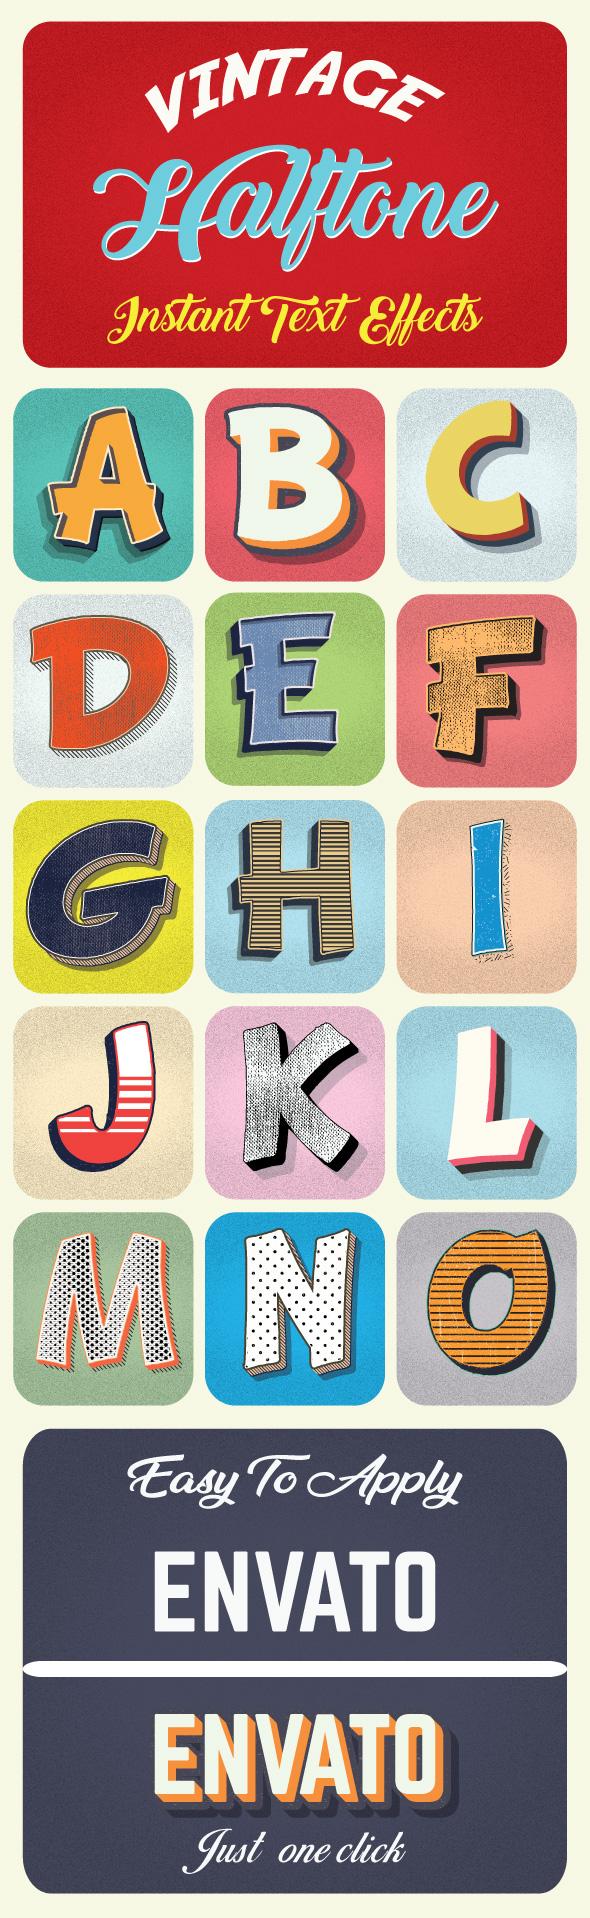 Vintage Halftone Text Effects - Styles Illustrator